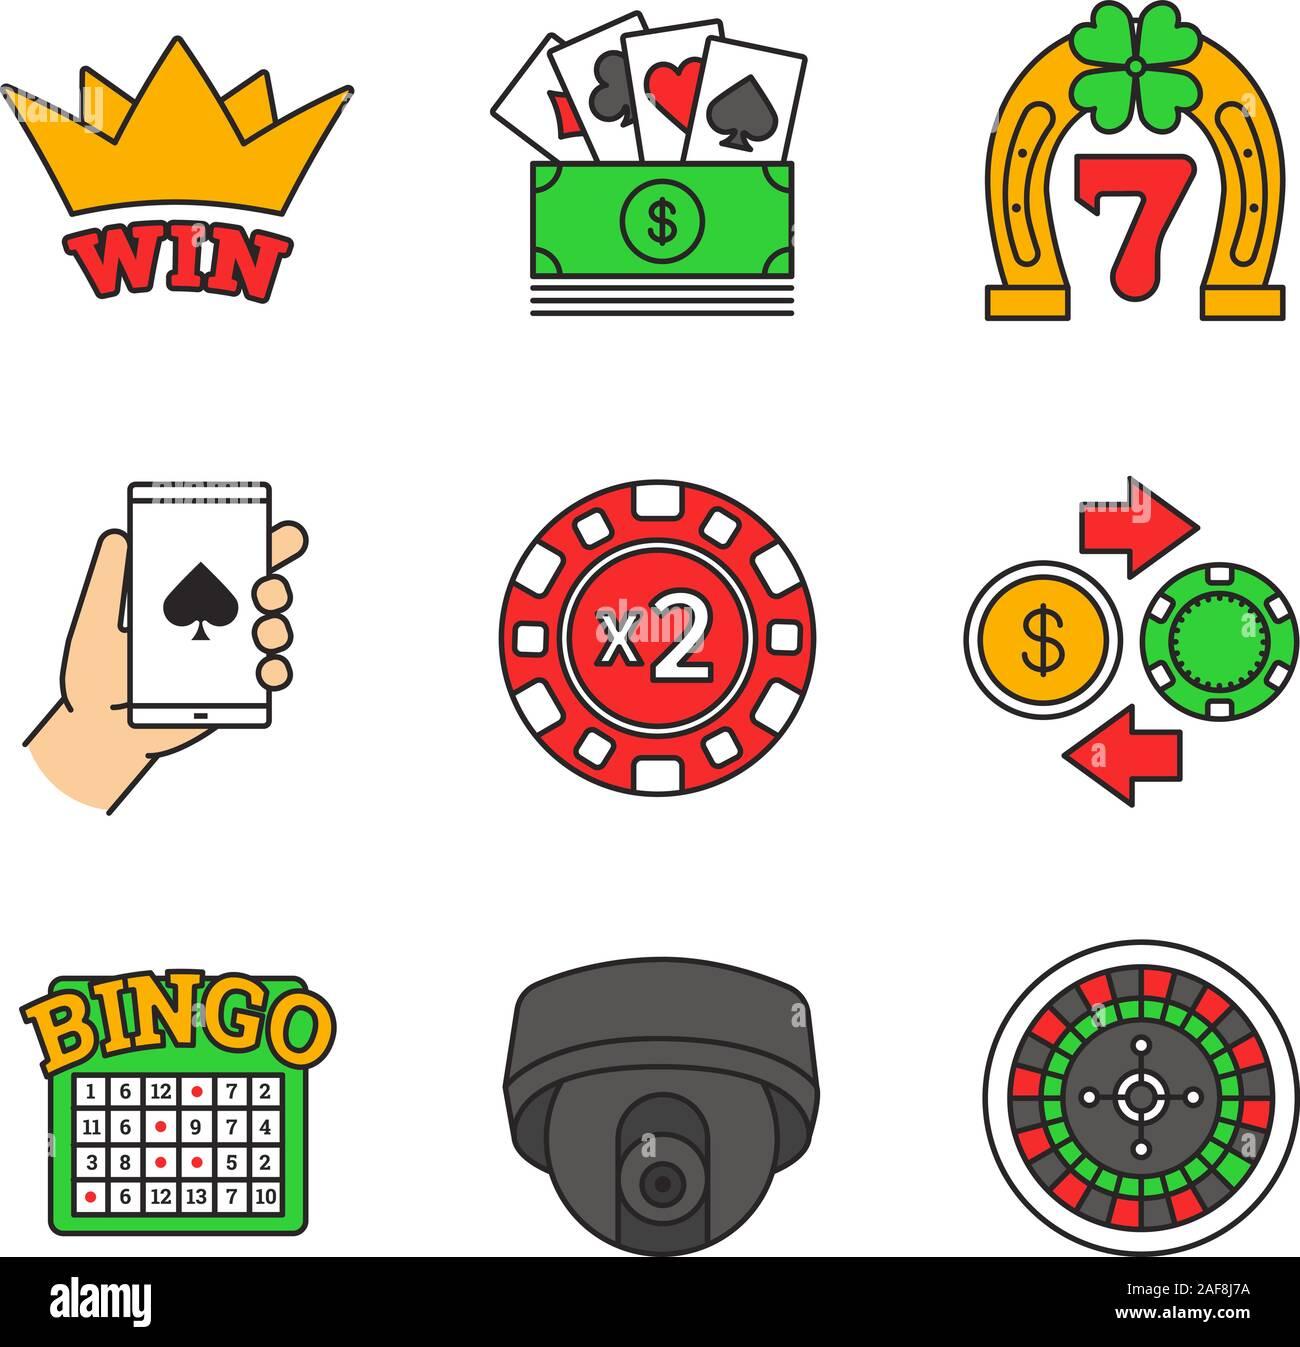 Crown casino online poker star city circus casino birmingham poker